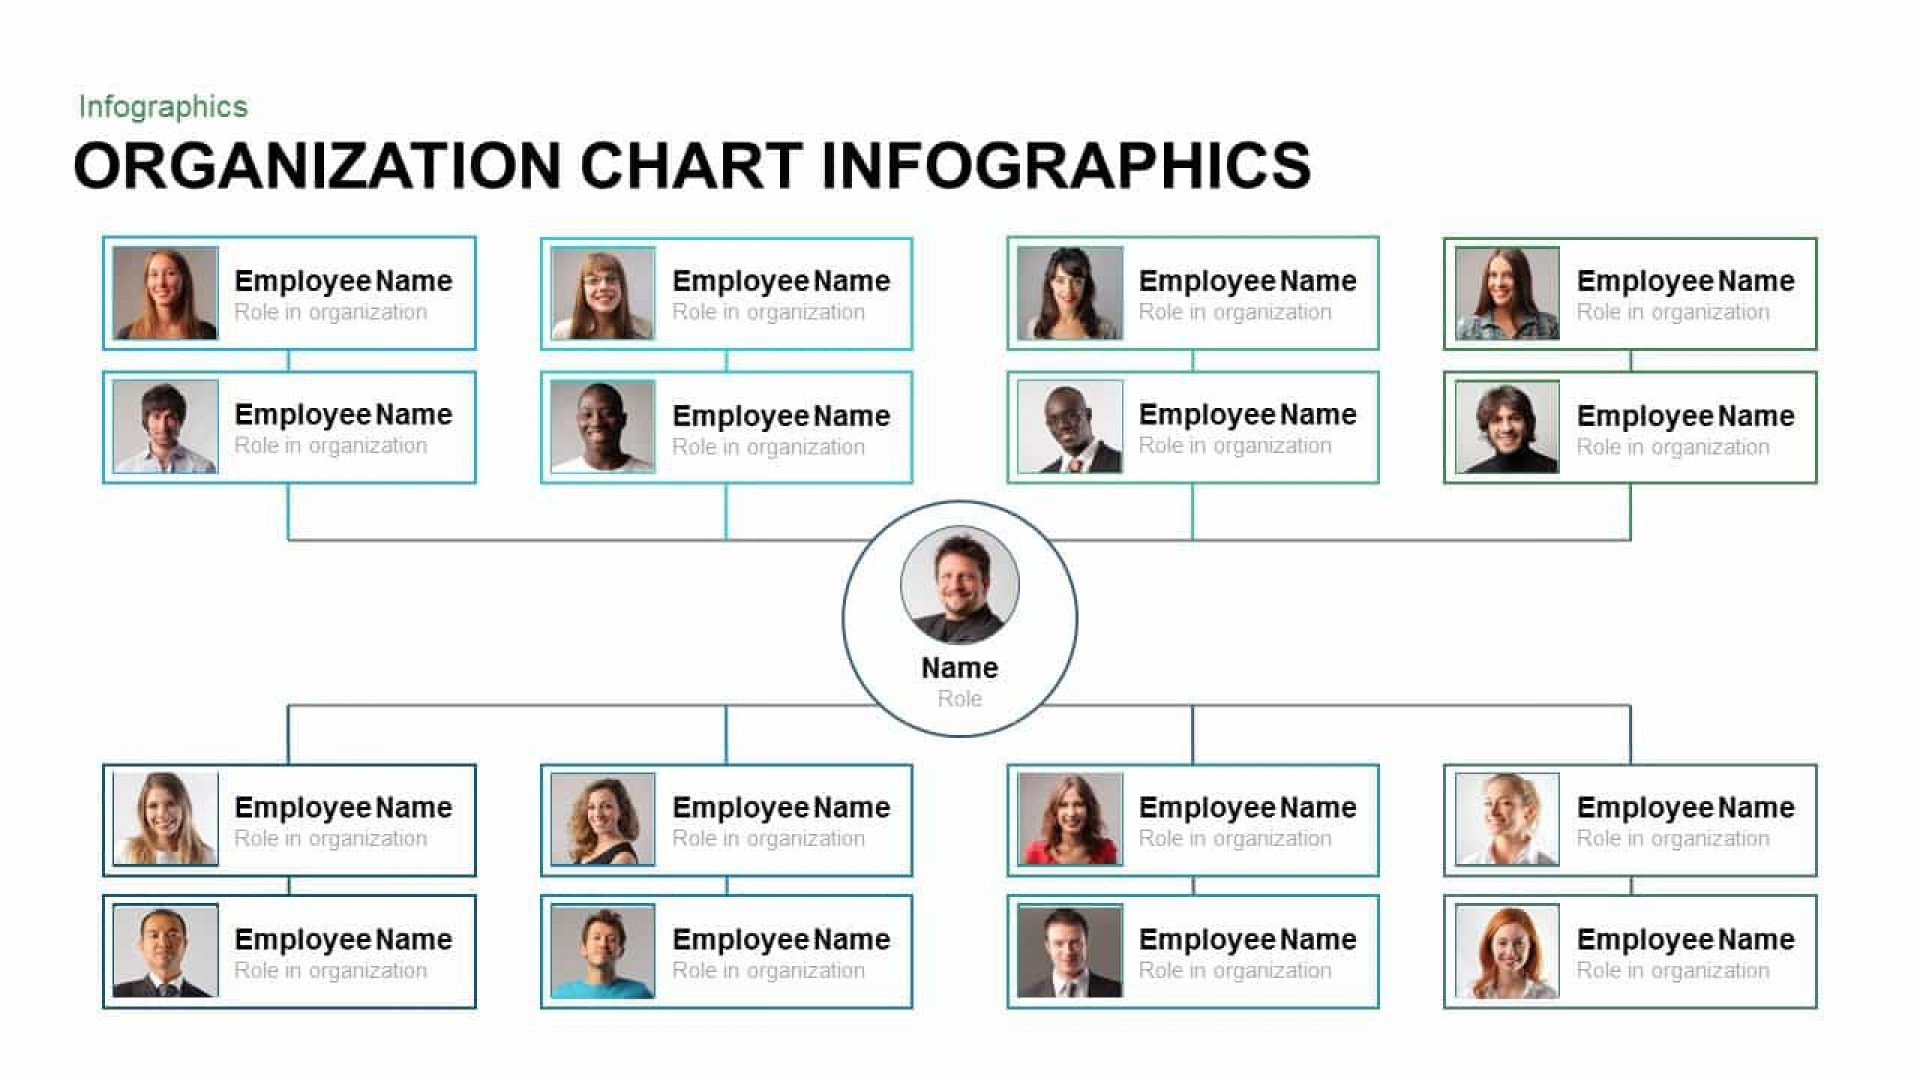 007 Top Org Chart Template Powerpoint Inspiration  Organization Free Download Organizational 2010 20131920